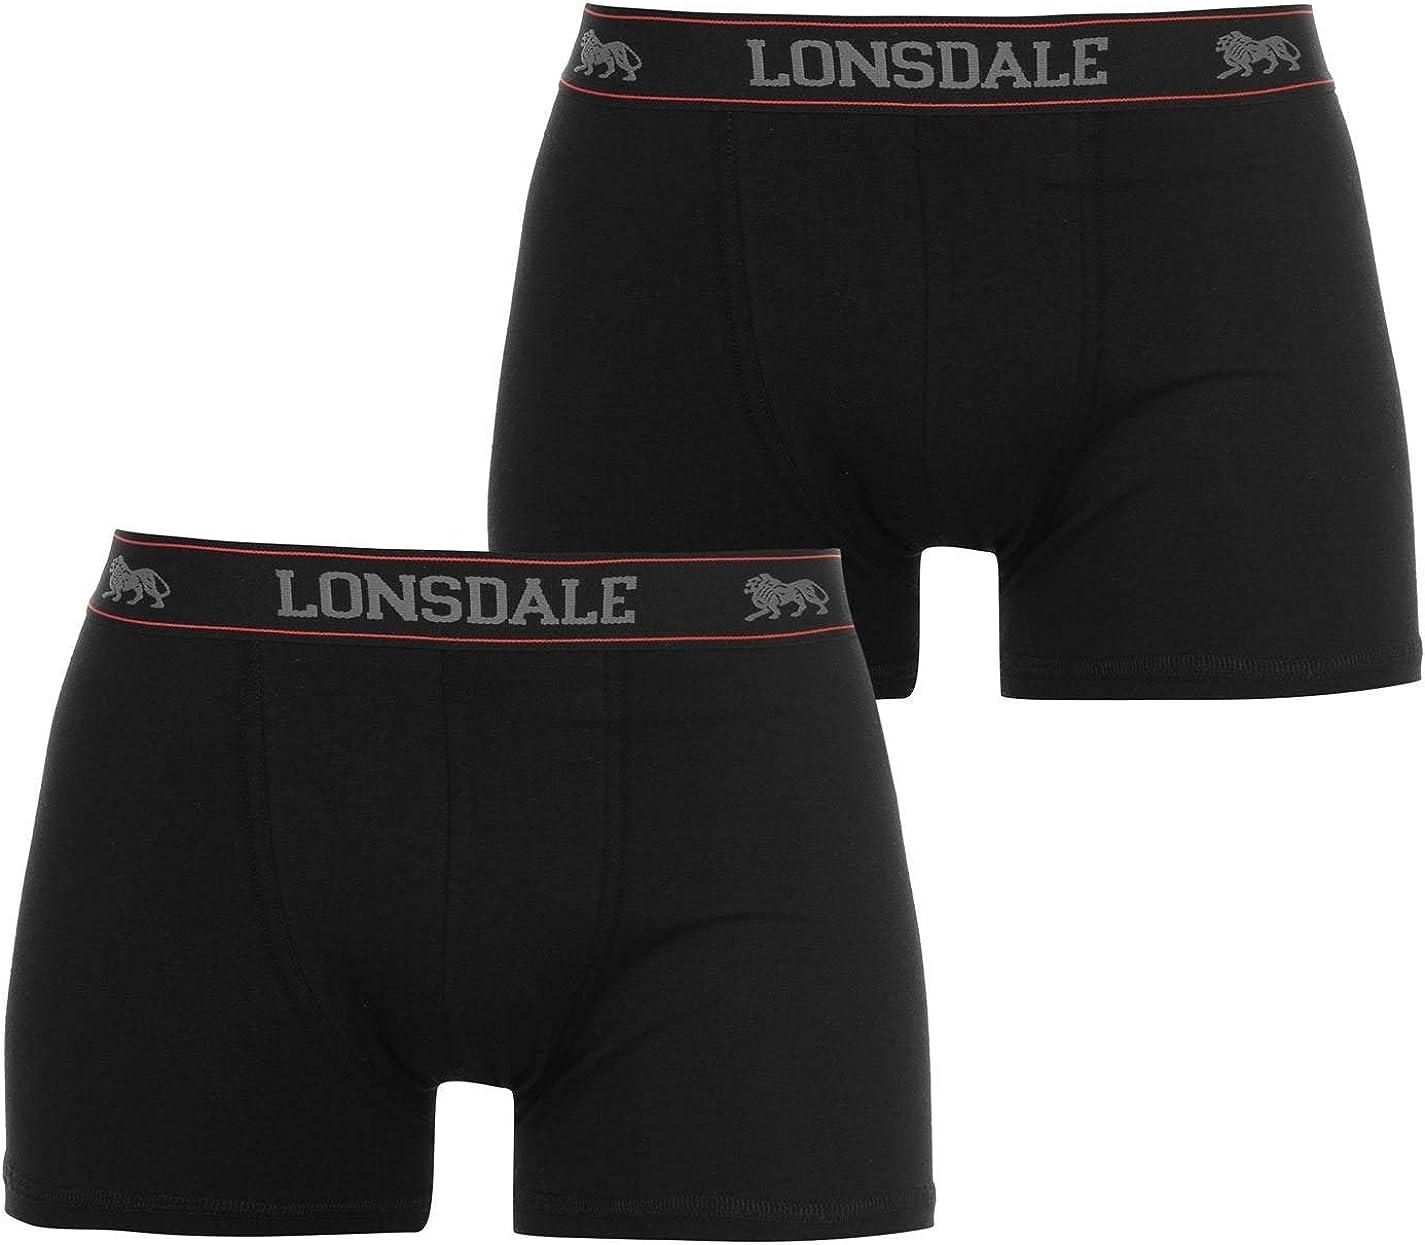 Lonsdale 2/pares de b/óxers para Hombre Pantalones Cortos Calzoncillos Ropa Interior